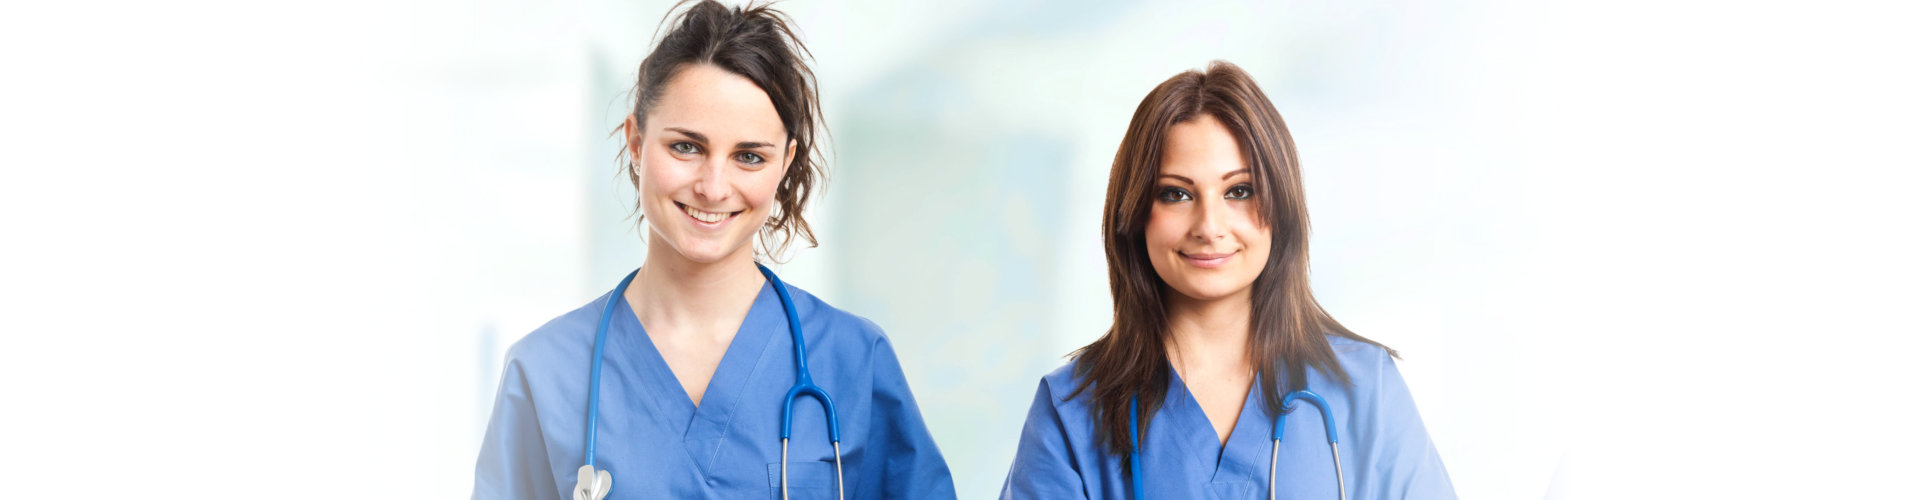 2 nurses facing the camera